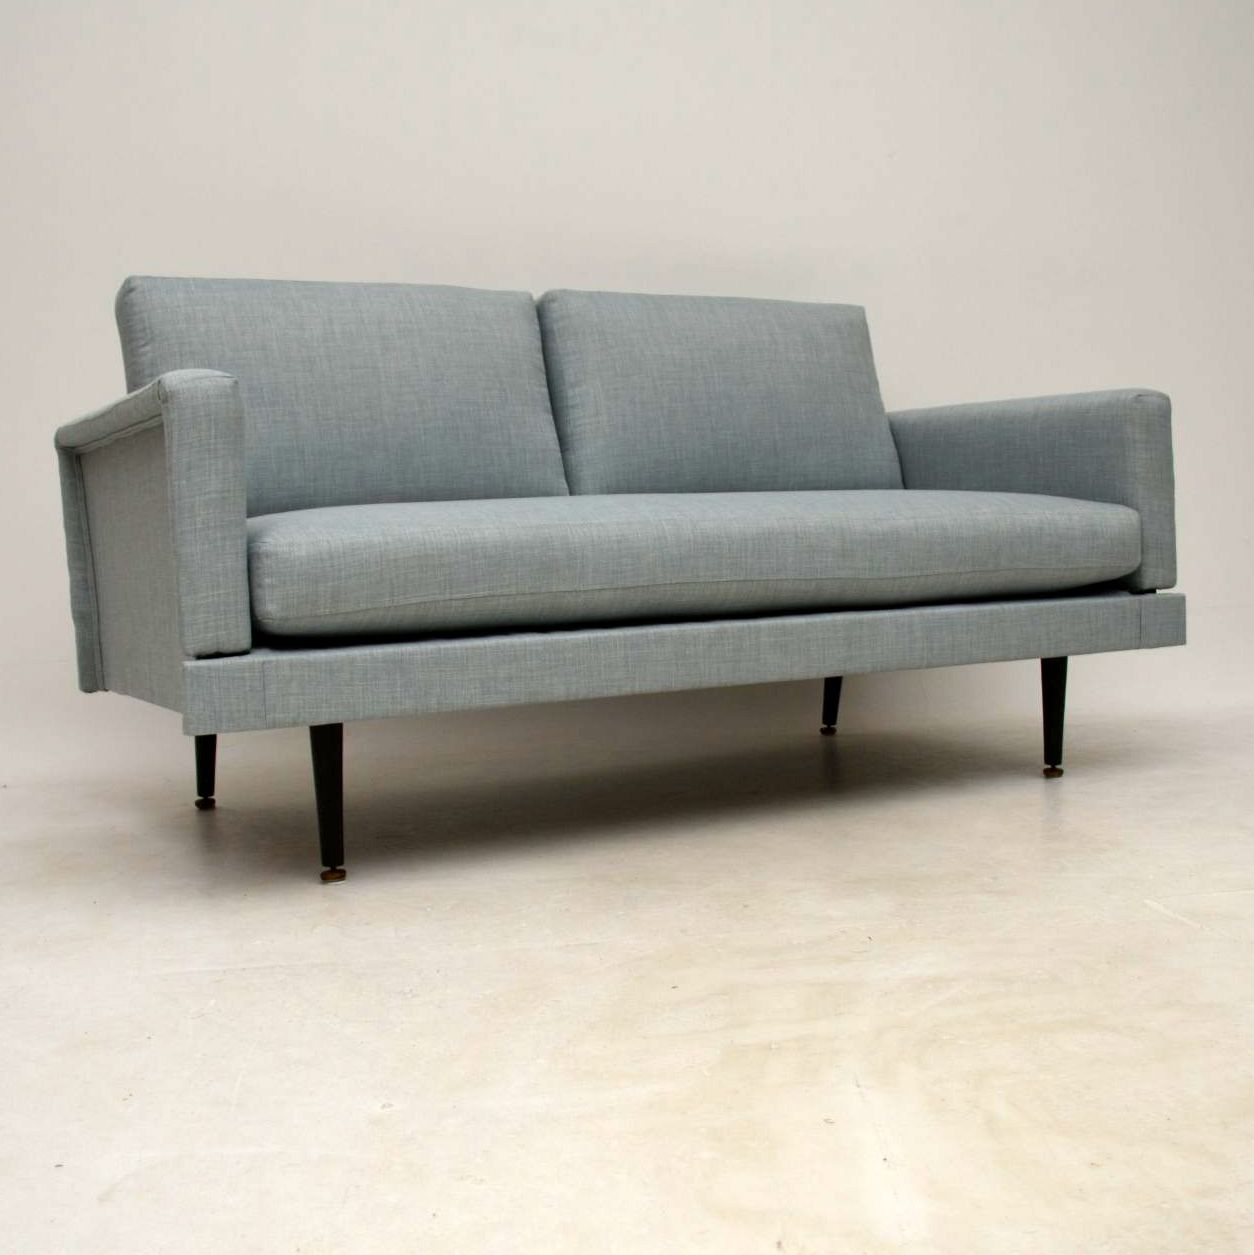 1950's Vintage Sofa Bed   Retrospective Interiors ...